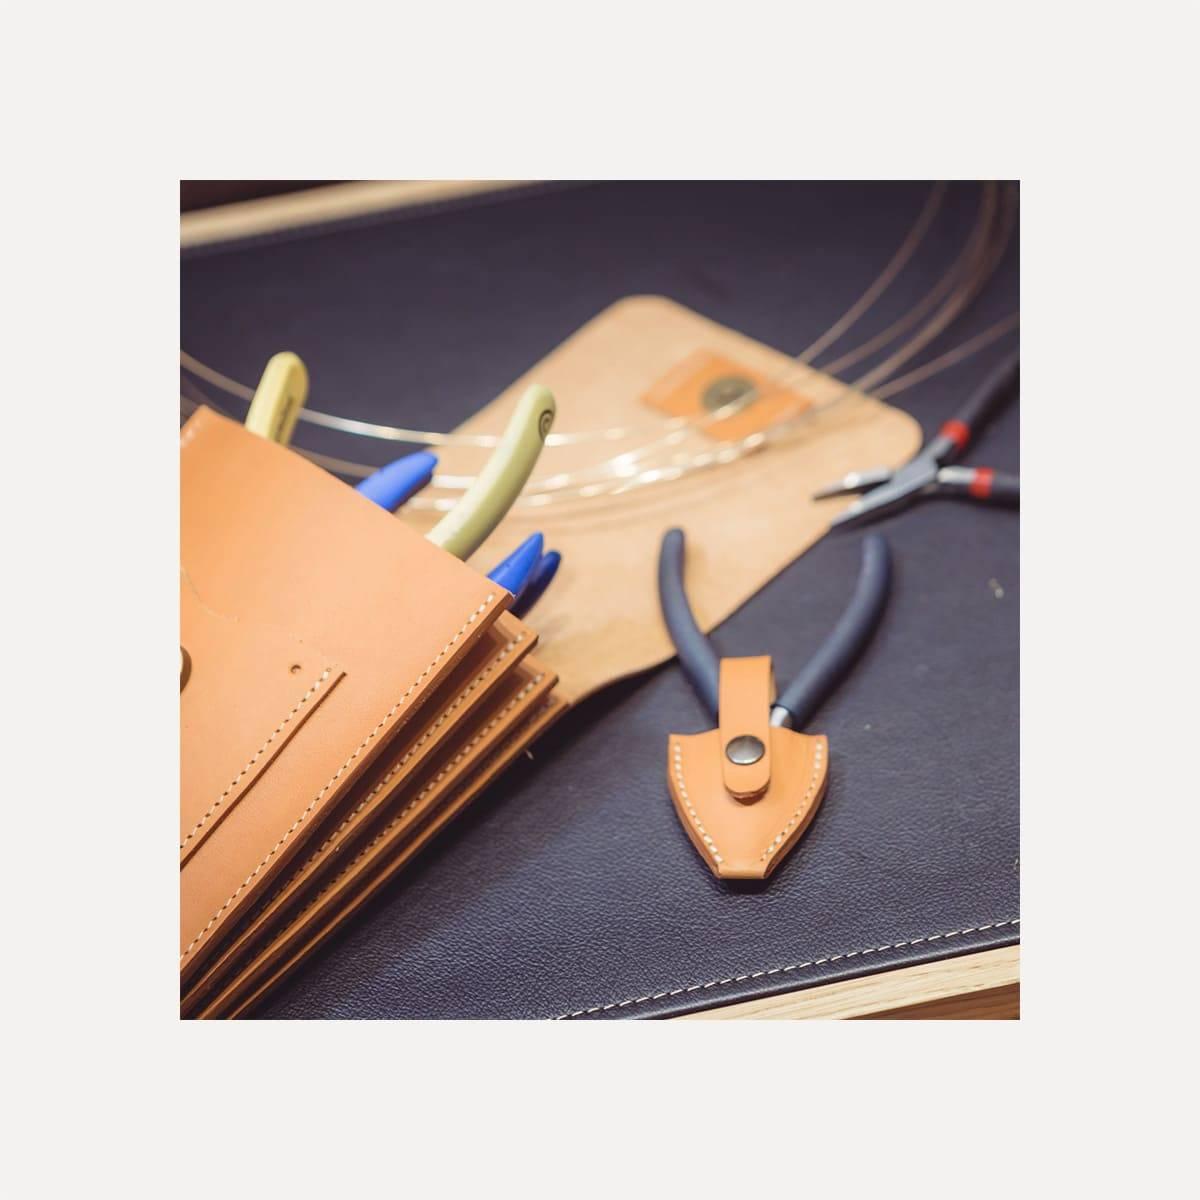 Jeweler's bag - BDC x Atelier Paulin (image n°10)